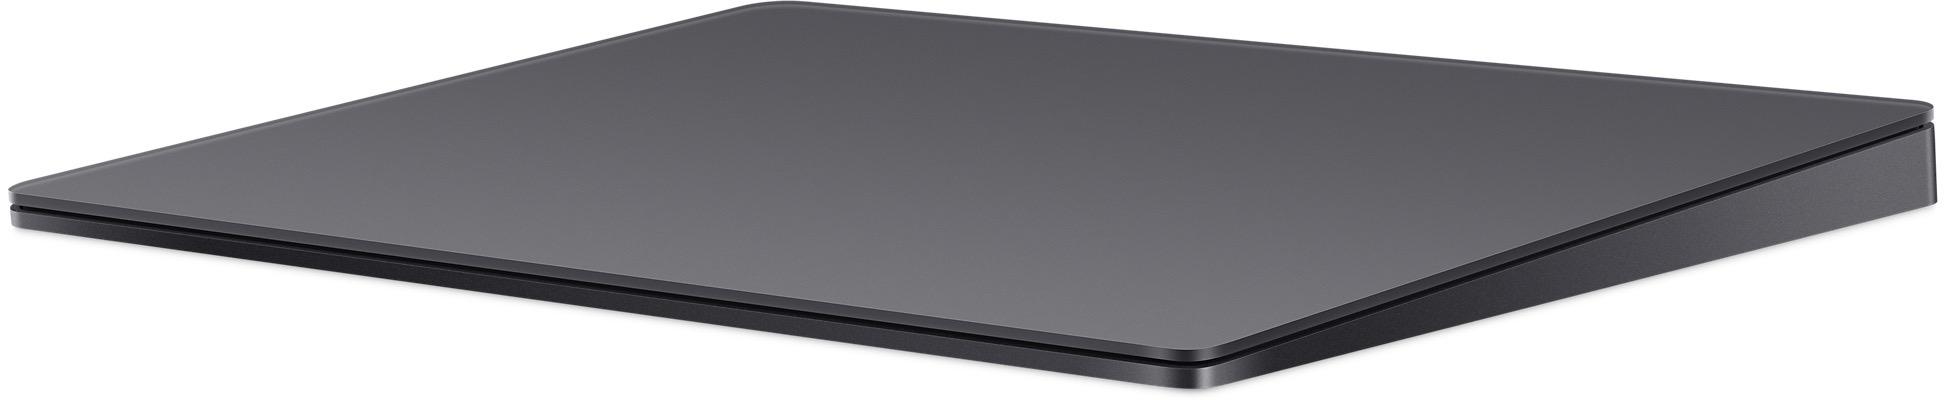 Magic Trackpad 2 na cor cinza espacial